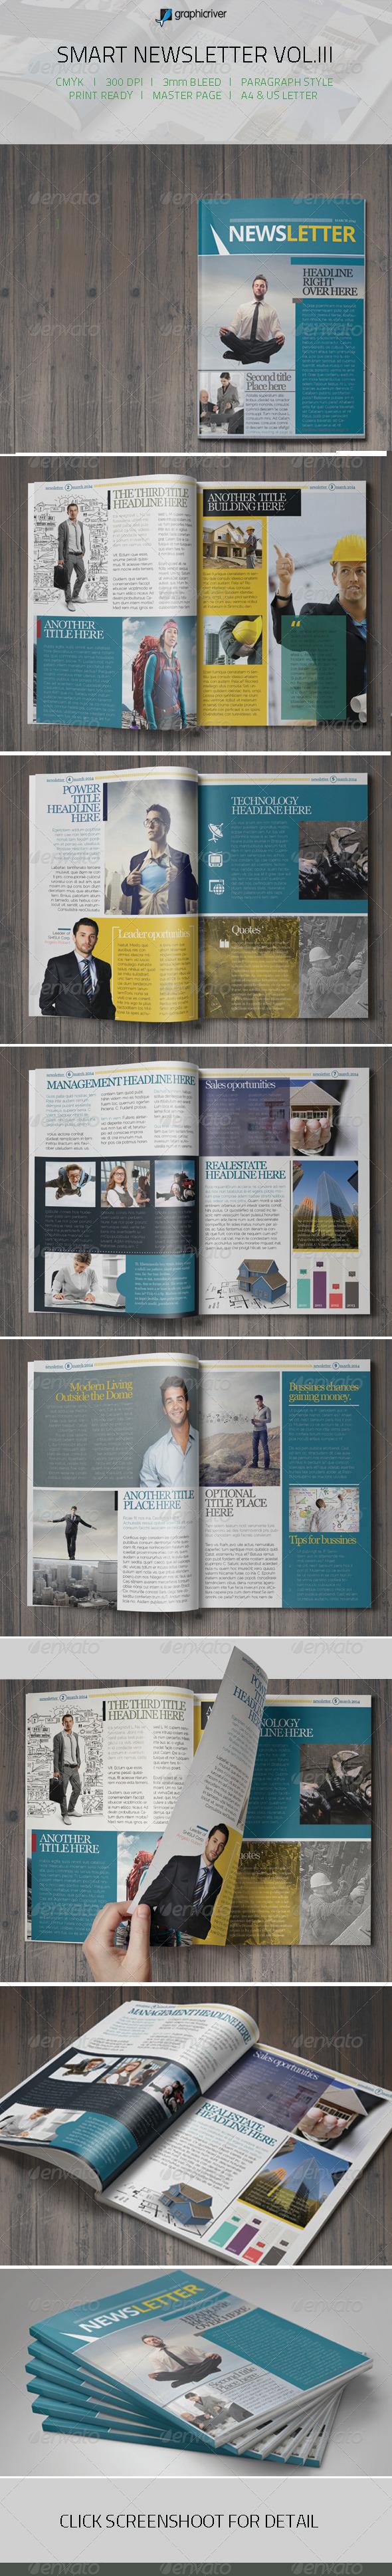 Smart Newsletter Vol.III - Newsletters Print Templates